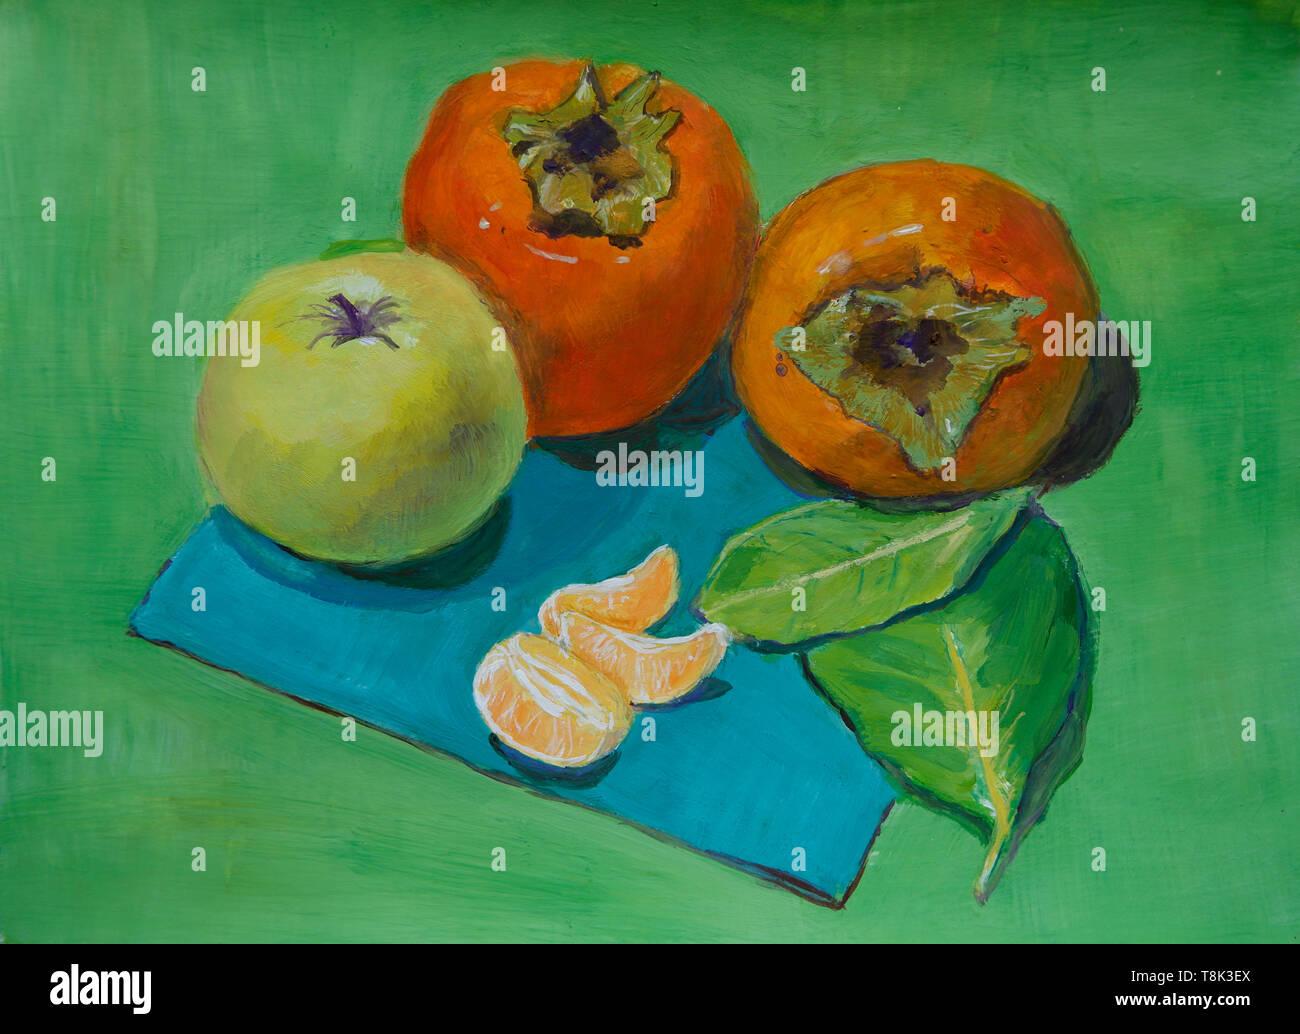 Ancora vita gouache pittura con kaki, Apple, mandarino, lemon tree lascia mele dateplum gouache mandarino Immagini Stock